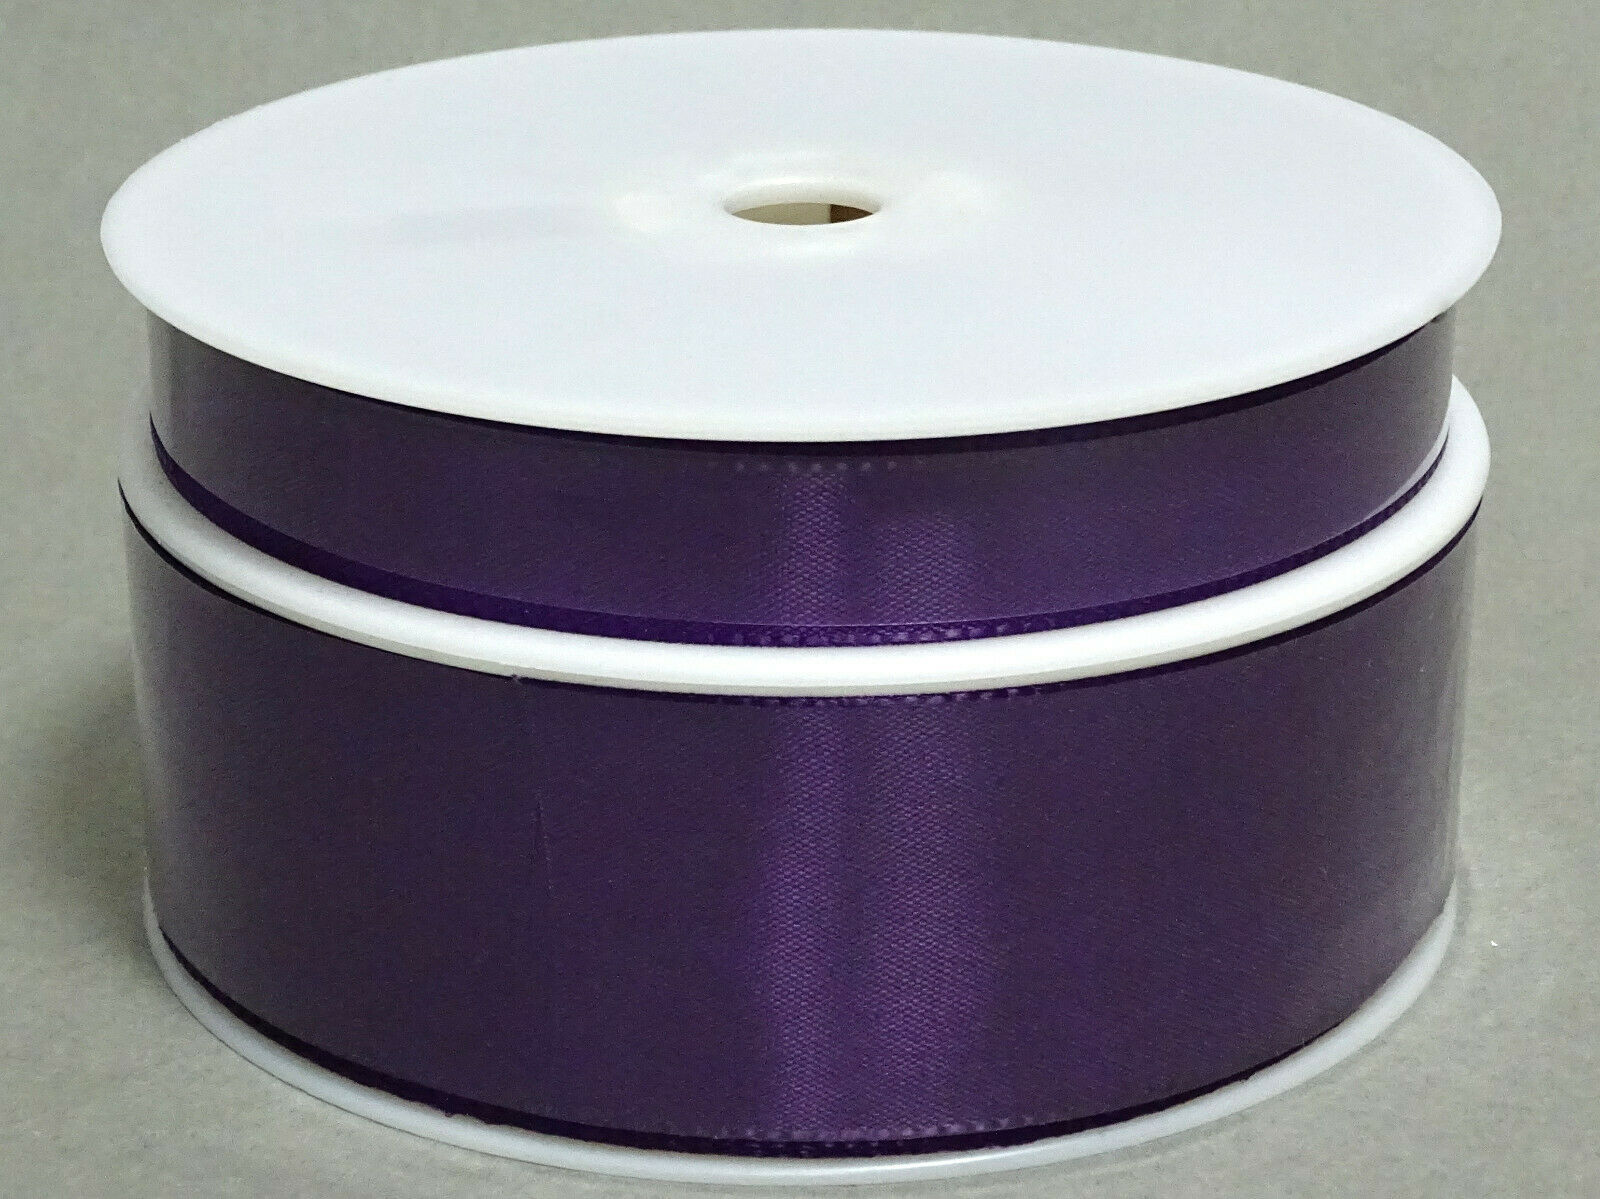 Seidenband Schleifenband 50 m x 15 / 25 / 40mm Dekoband ab 0,08€/m Geschenkband  - Violett 133, 40 mm x 50 m